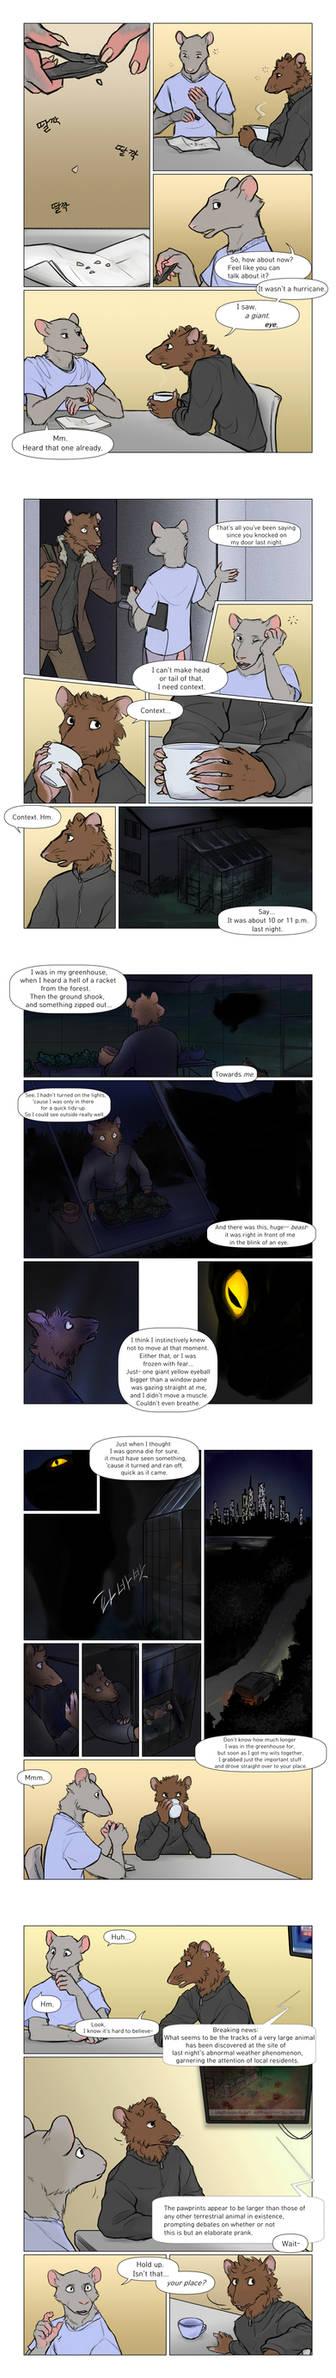 Assignment - Comic